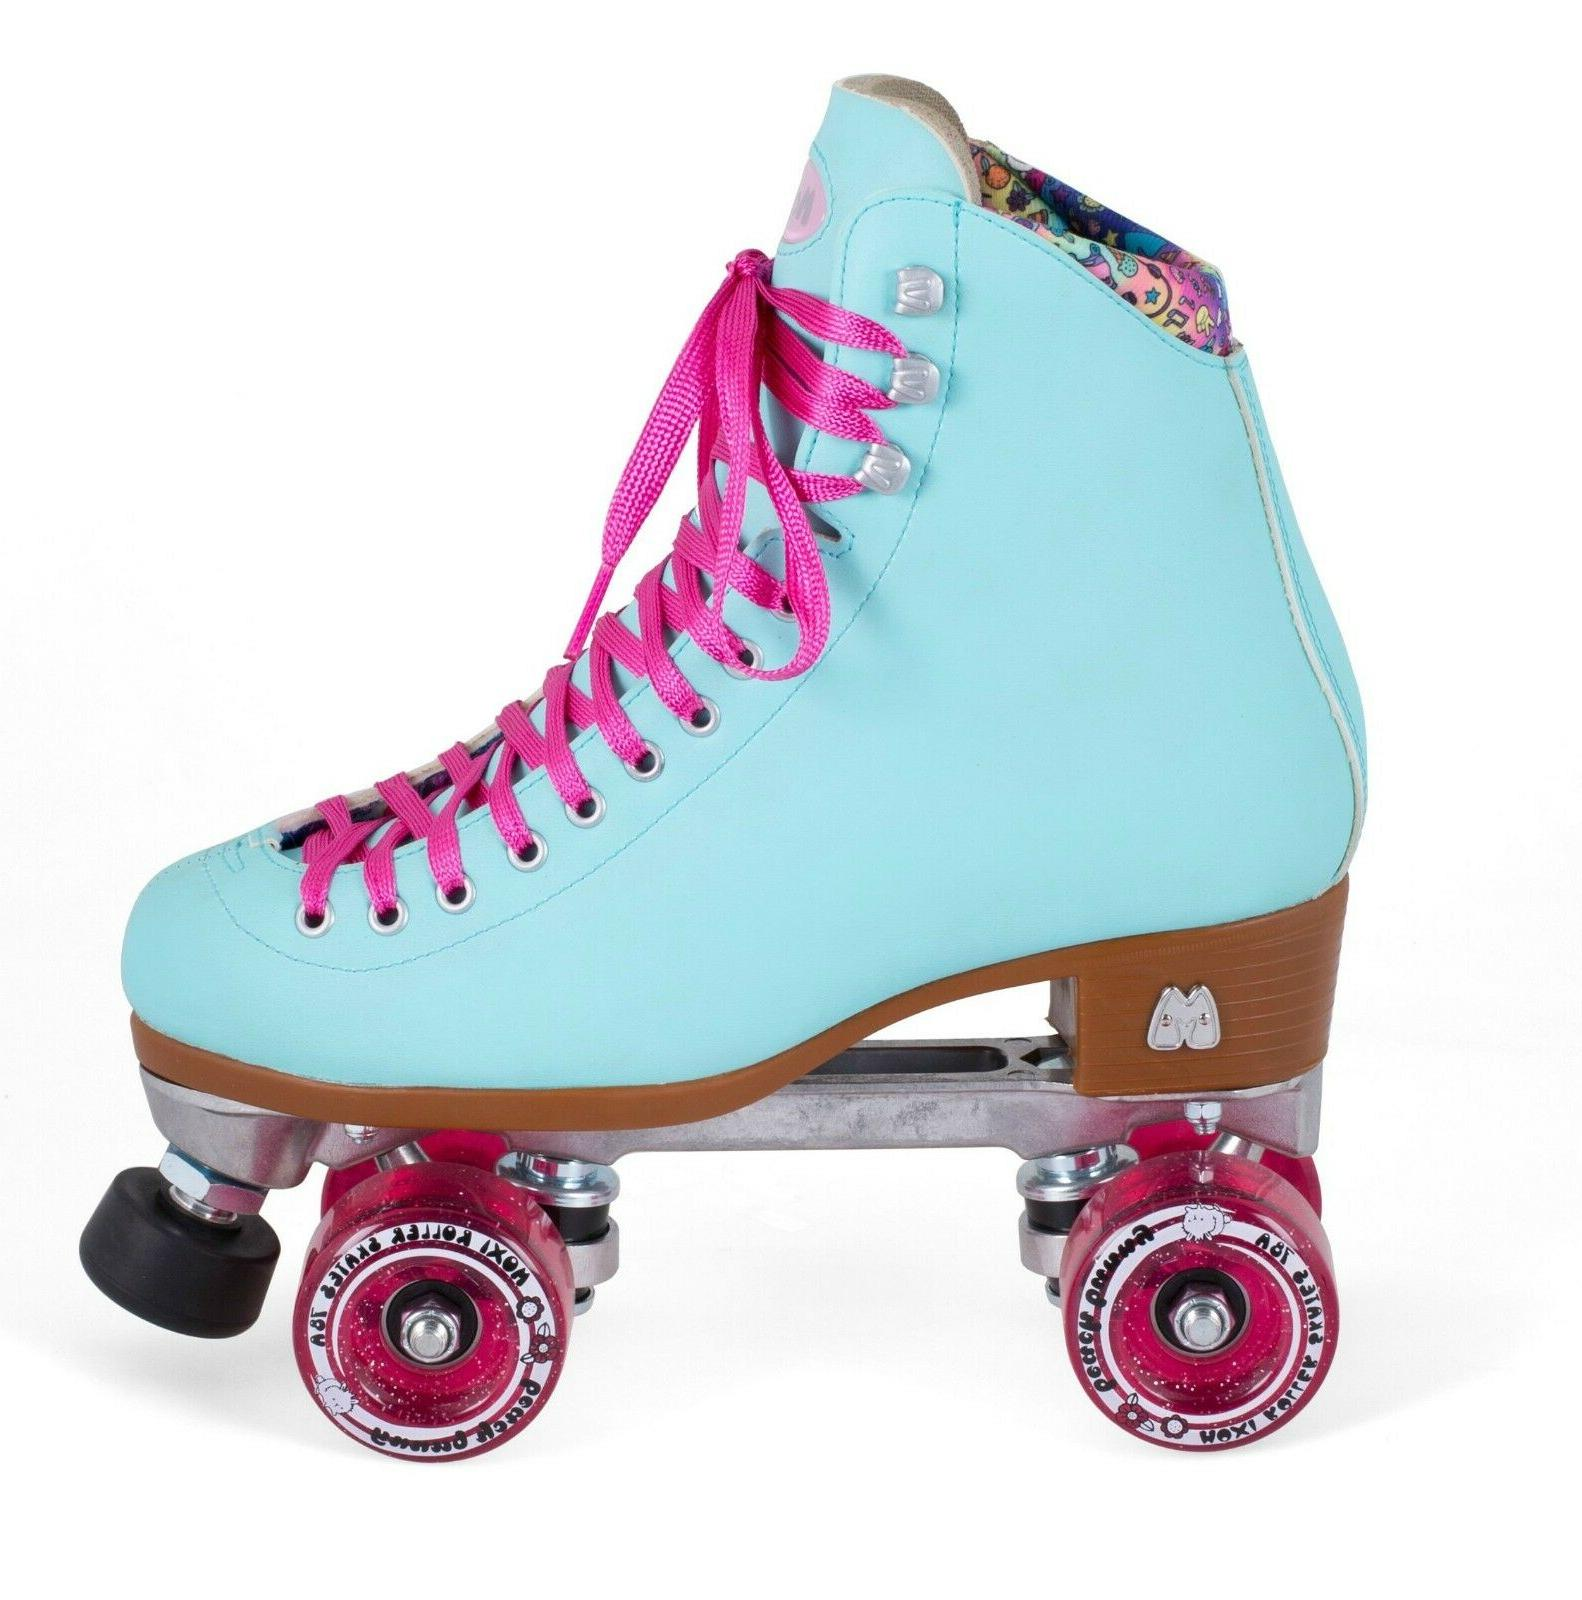 beach bunny indoor outdoor quad roller skates